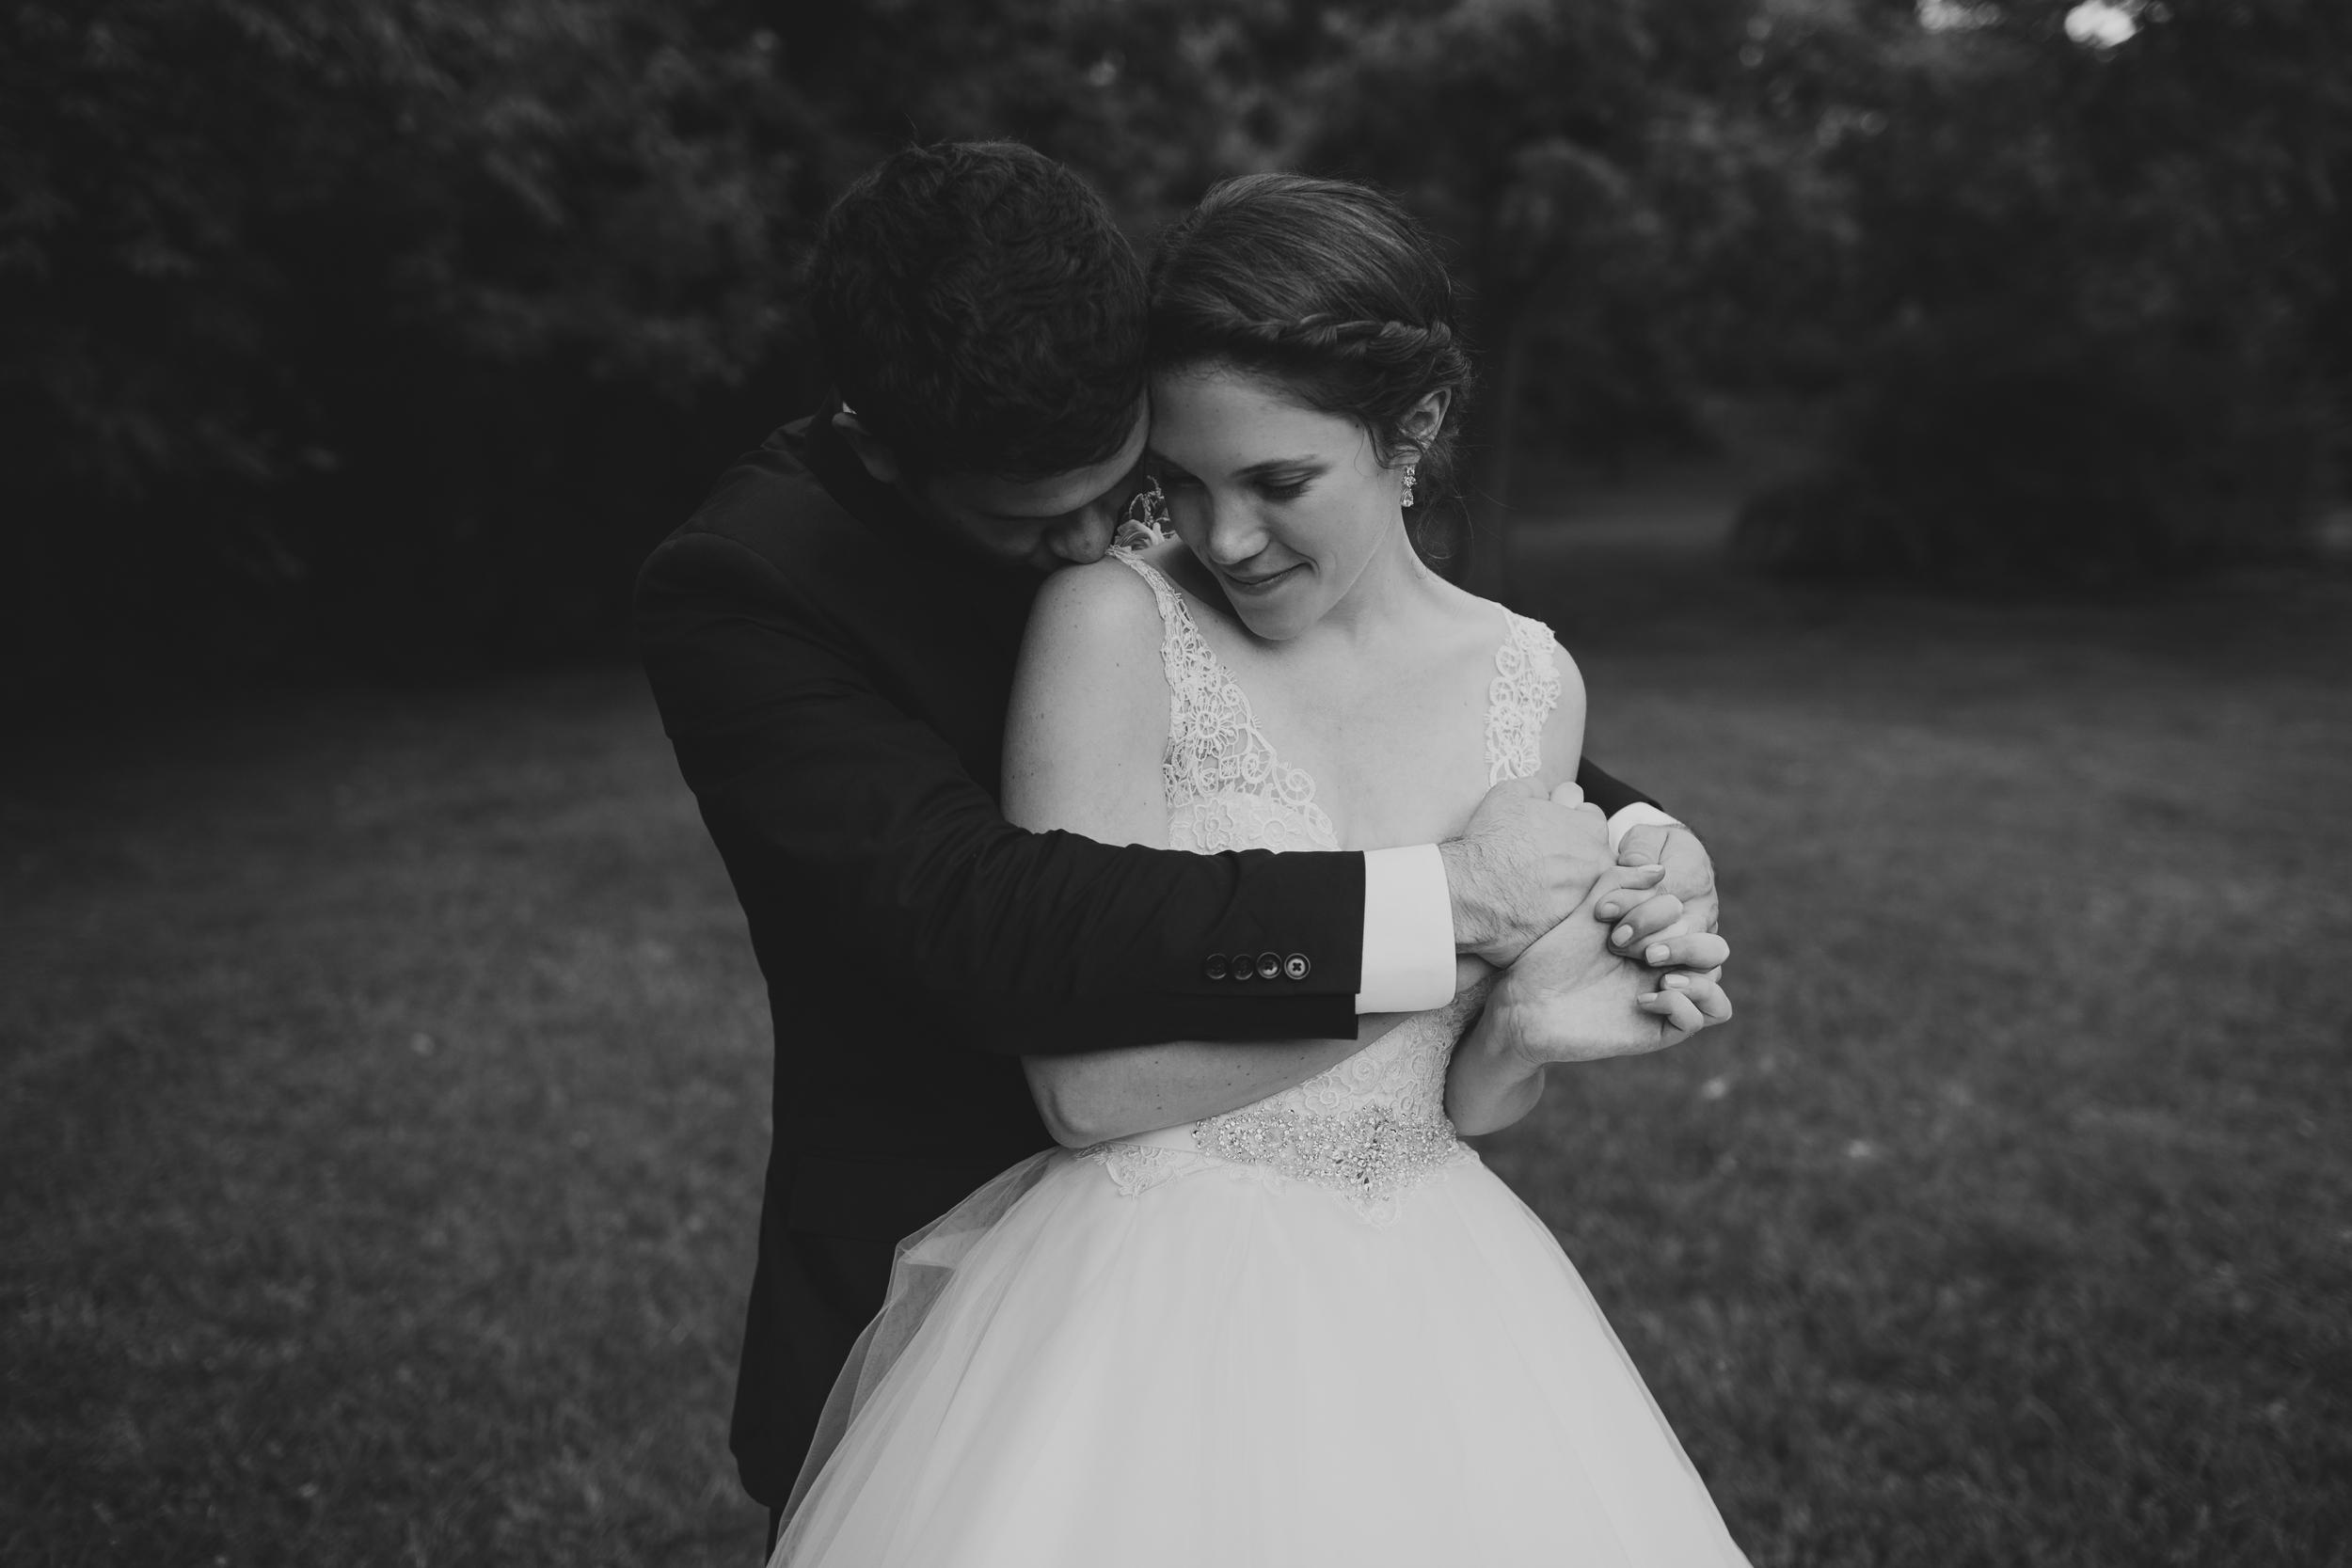 Herring Wedding - Alicia White Photography-1111 copy.jpg